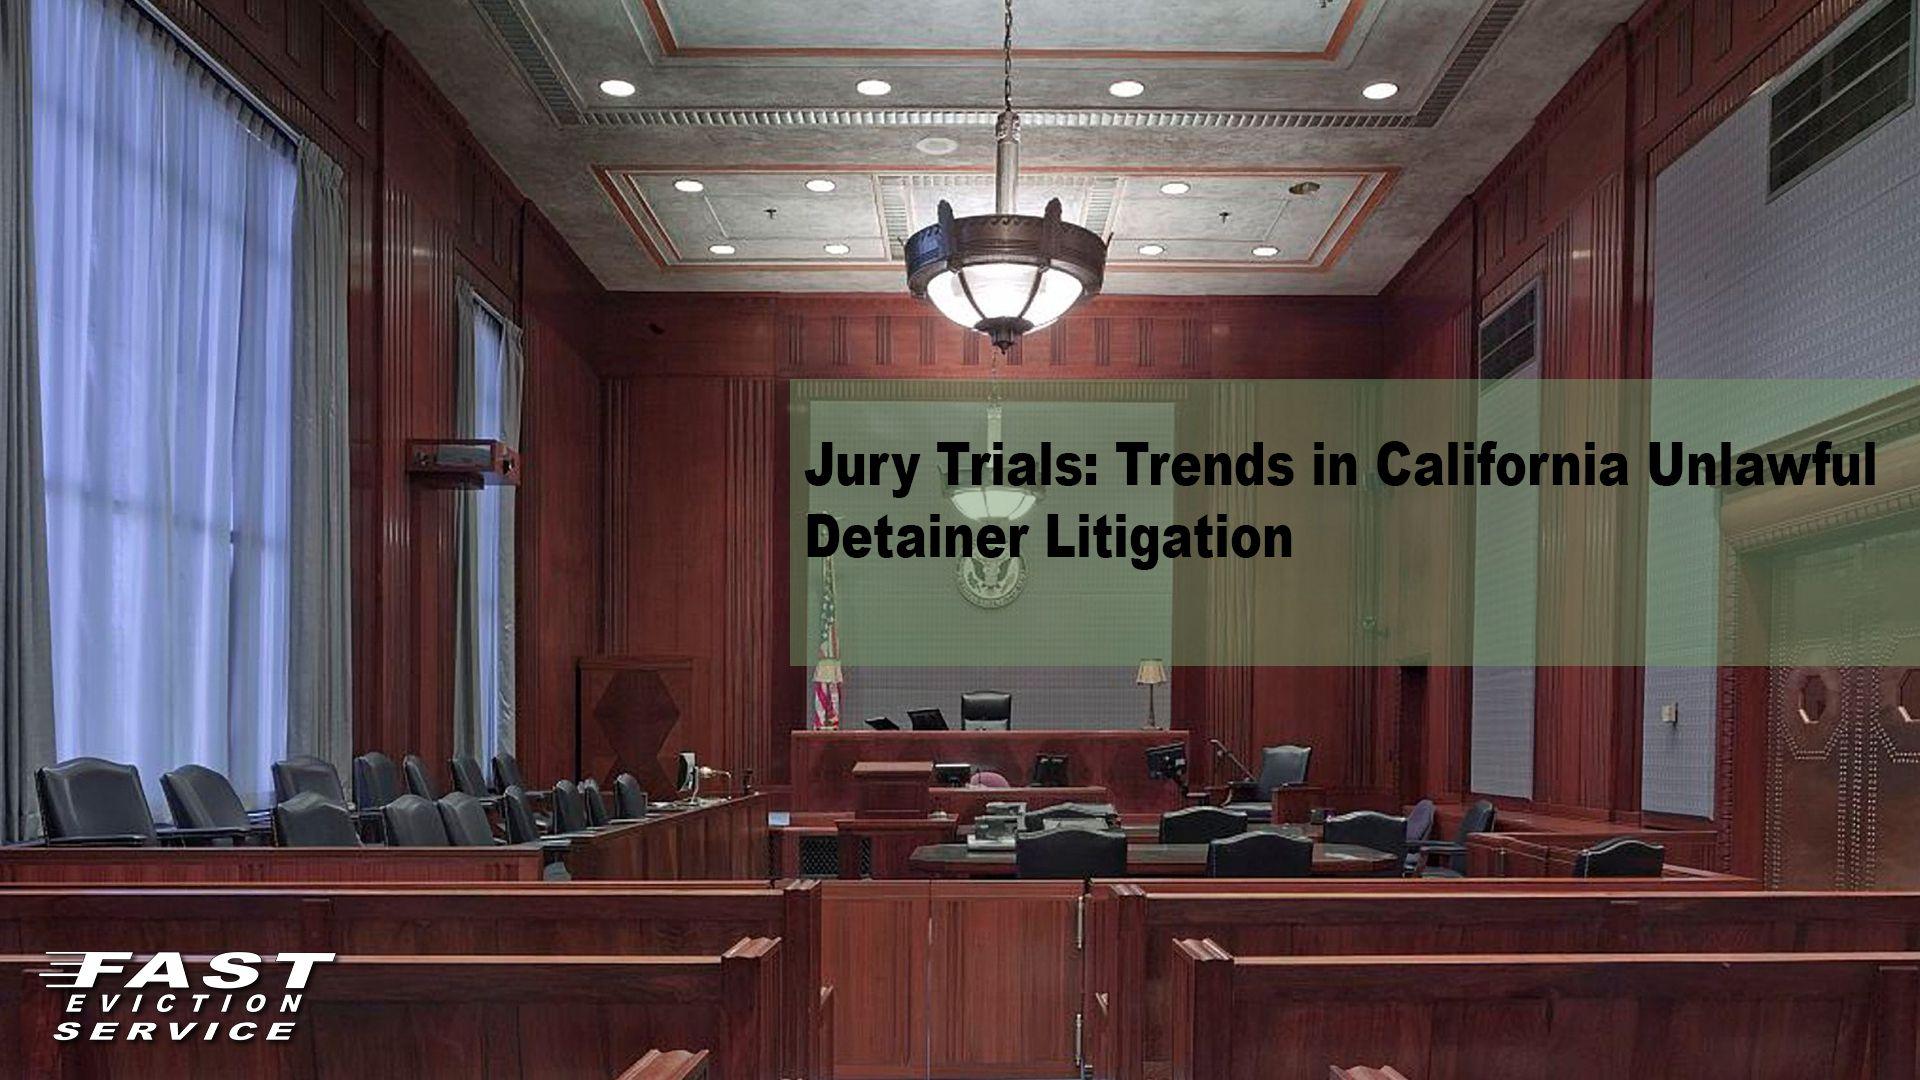 Jury Trials Trends In California Unlawful Detainer Litigation